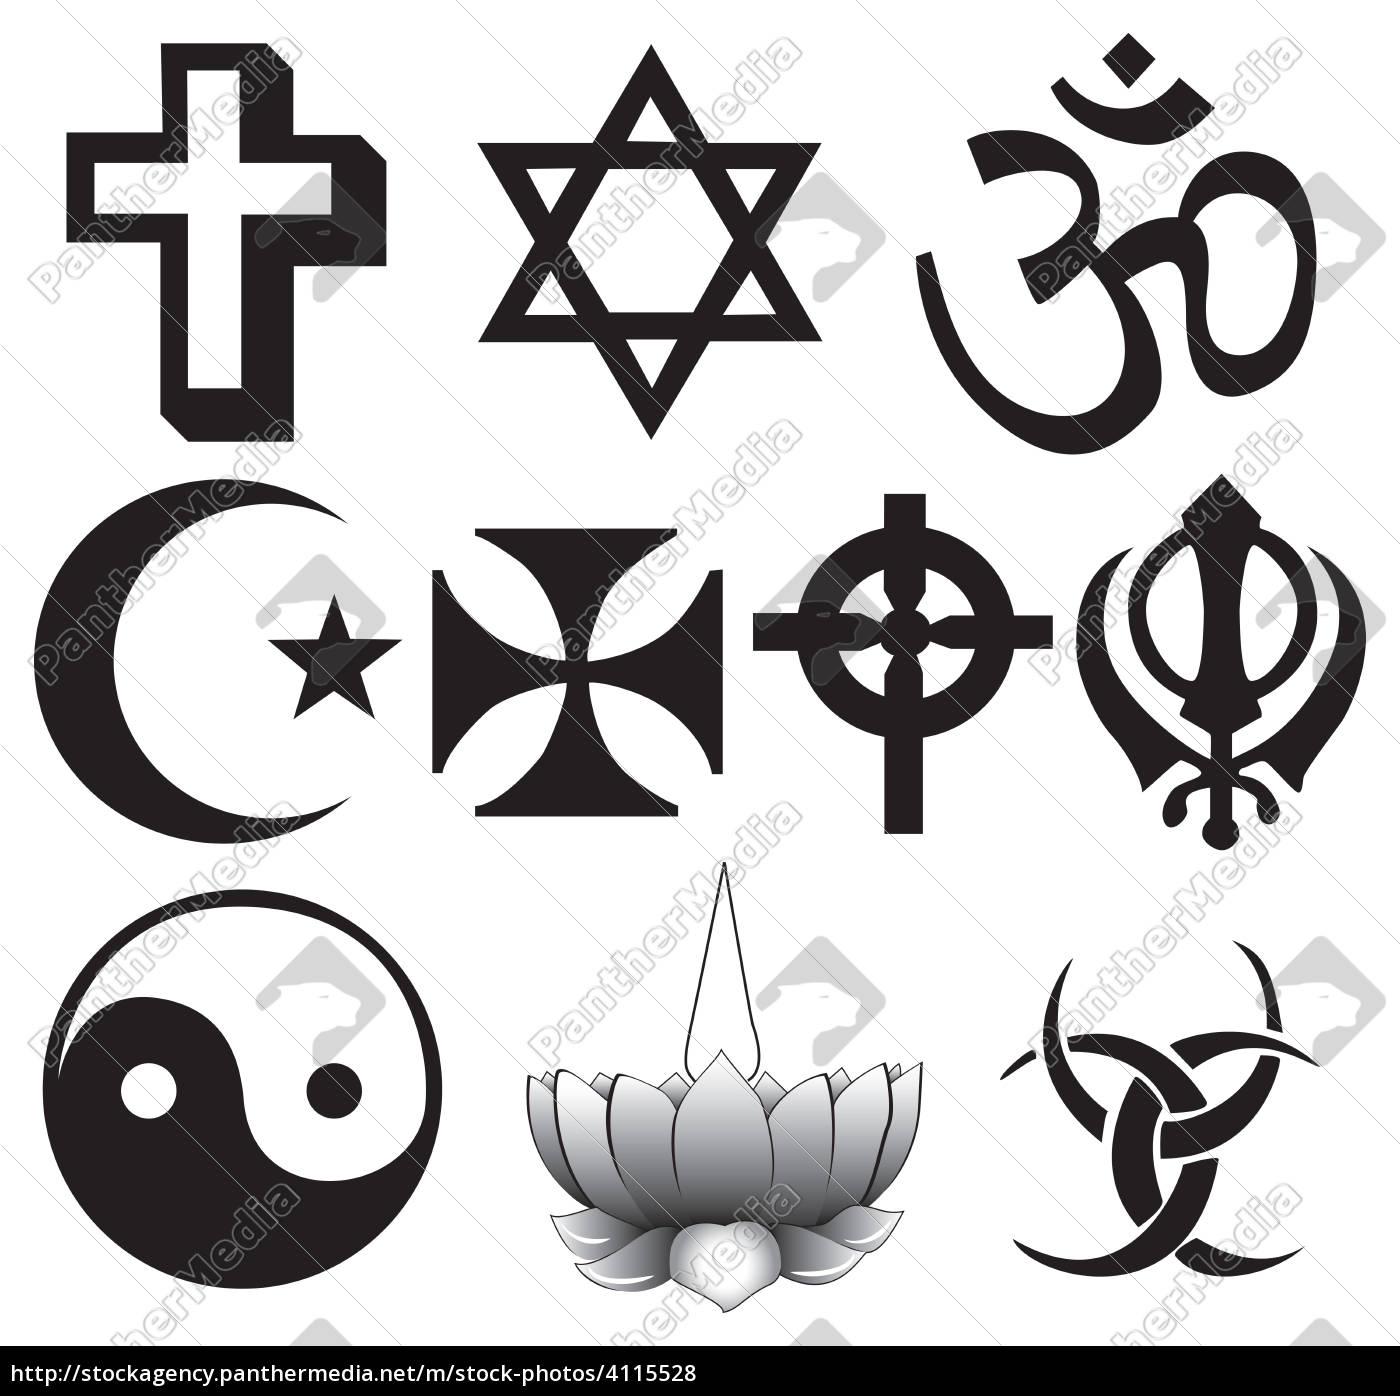 verschiedene religionen symbole - Lizenzfreies Foto